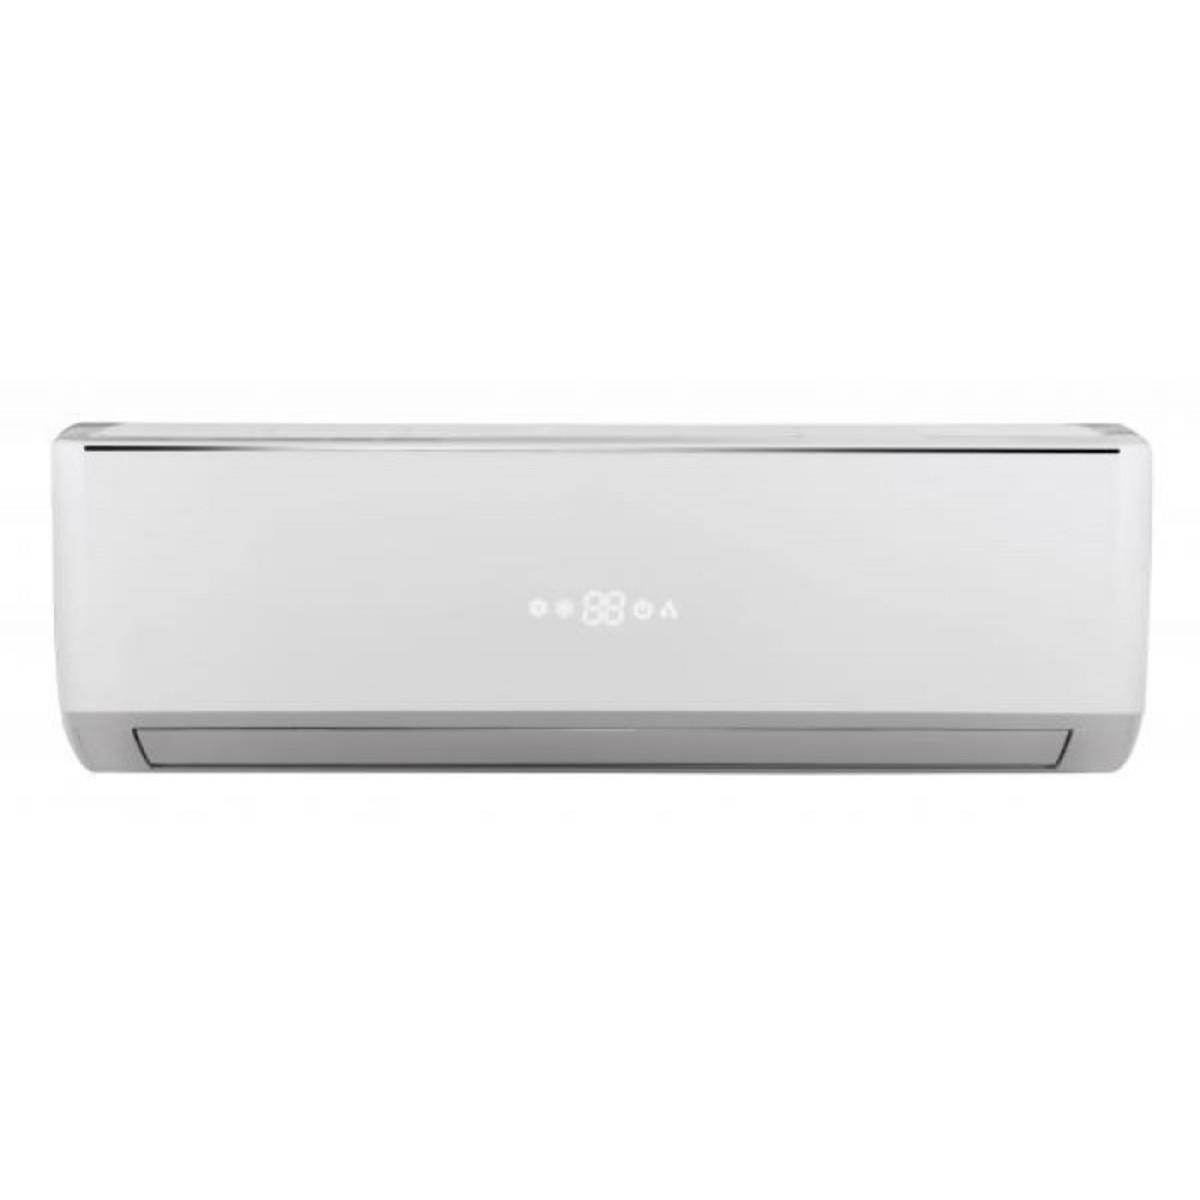 GIM09A  1.0匹 R410A 纖巧型變頻冷暖分體式冷氣機  香港行貨代理保用